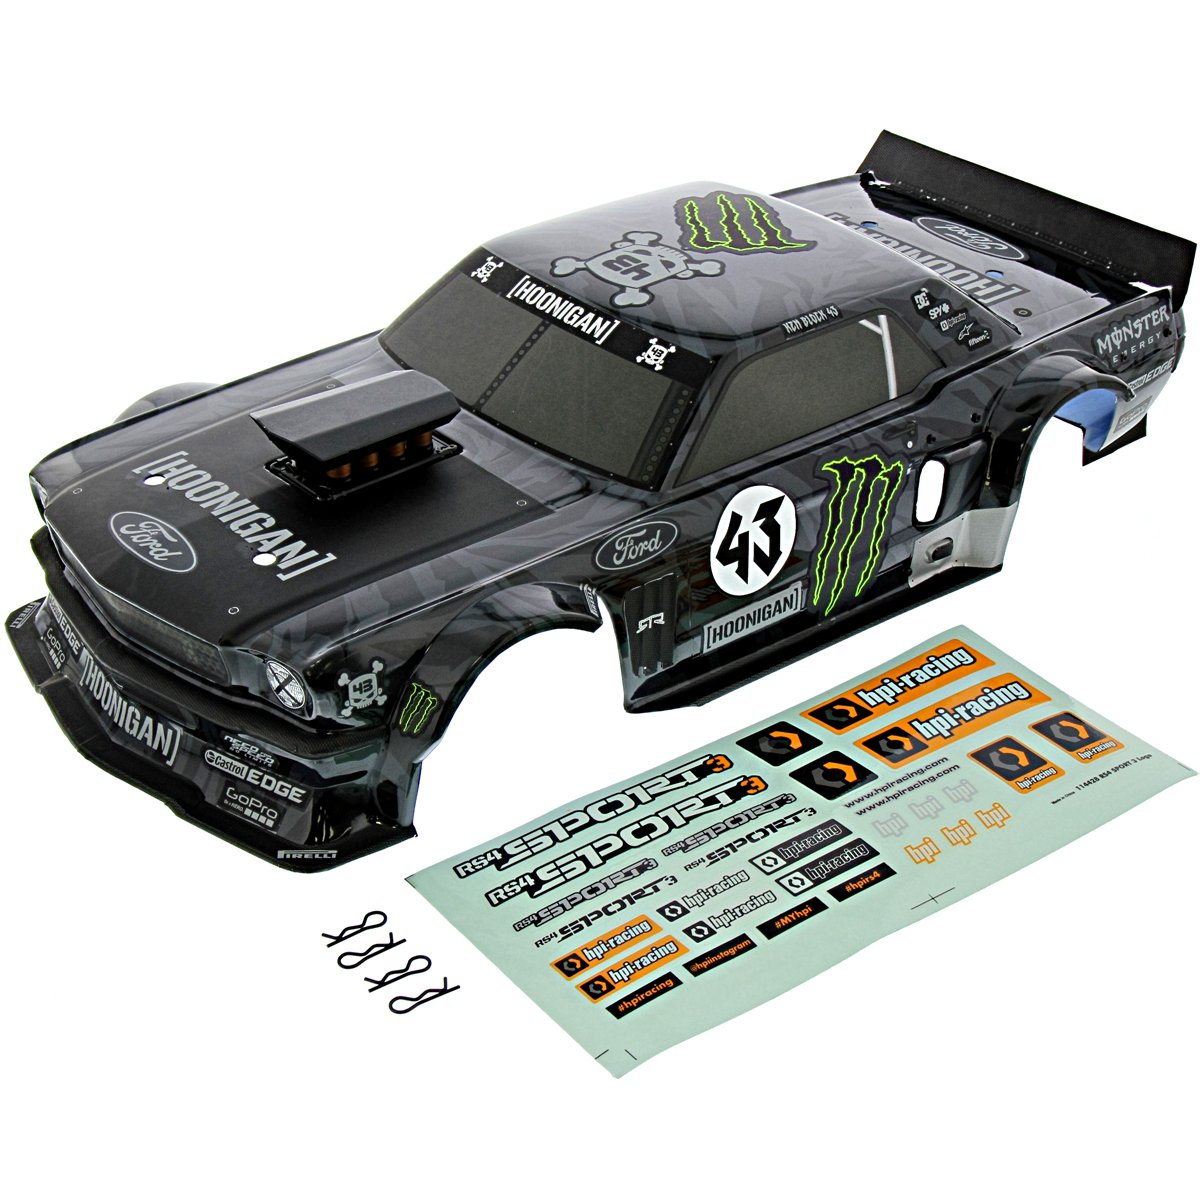 Amazon com hpi 1 10 rs4 sport 3 4wd drift ken block 1965 ford mustang hoonicorn rtr body toys games